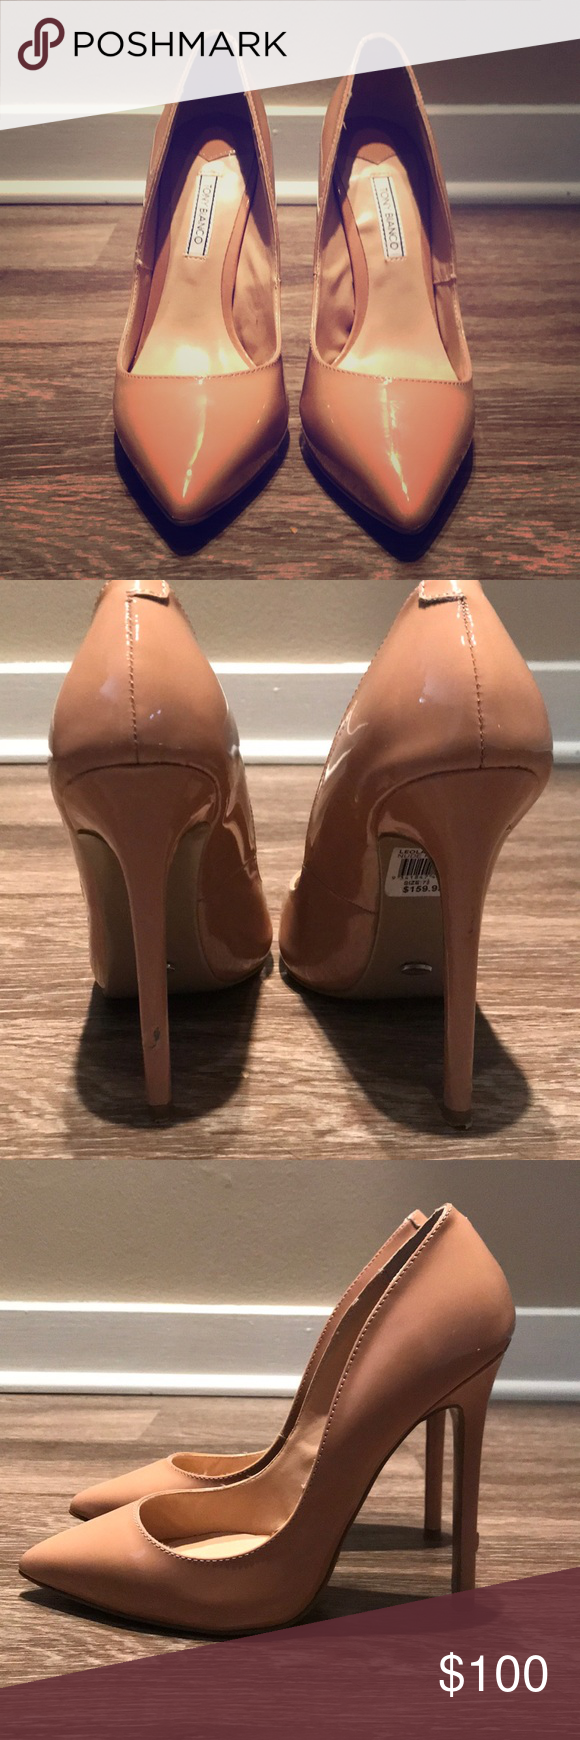 af47c3c097 Tony Biano Nude Patent Leola SZ 7.5 Tony Bianco Nude Patent SZ 7.5 Worn  Once Tony Bianco Shoes Heels